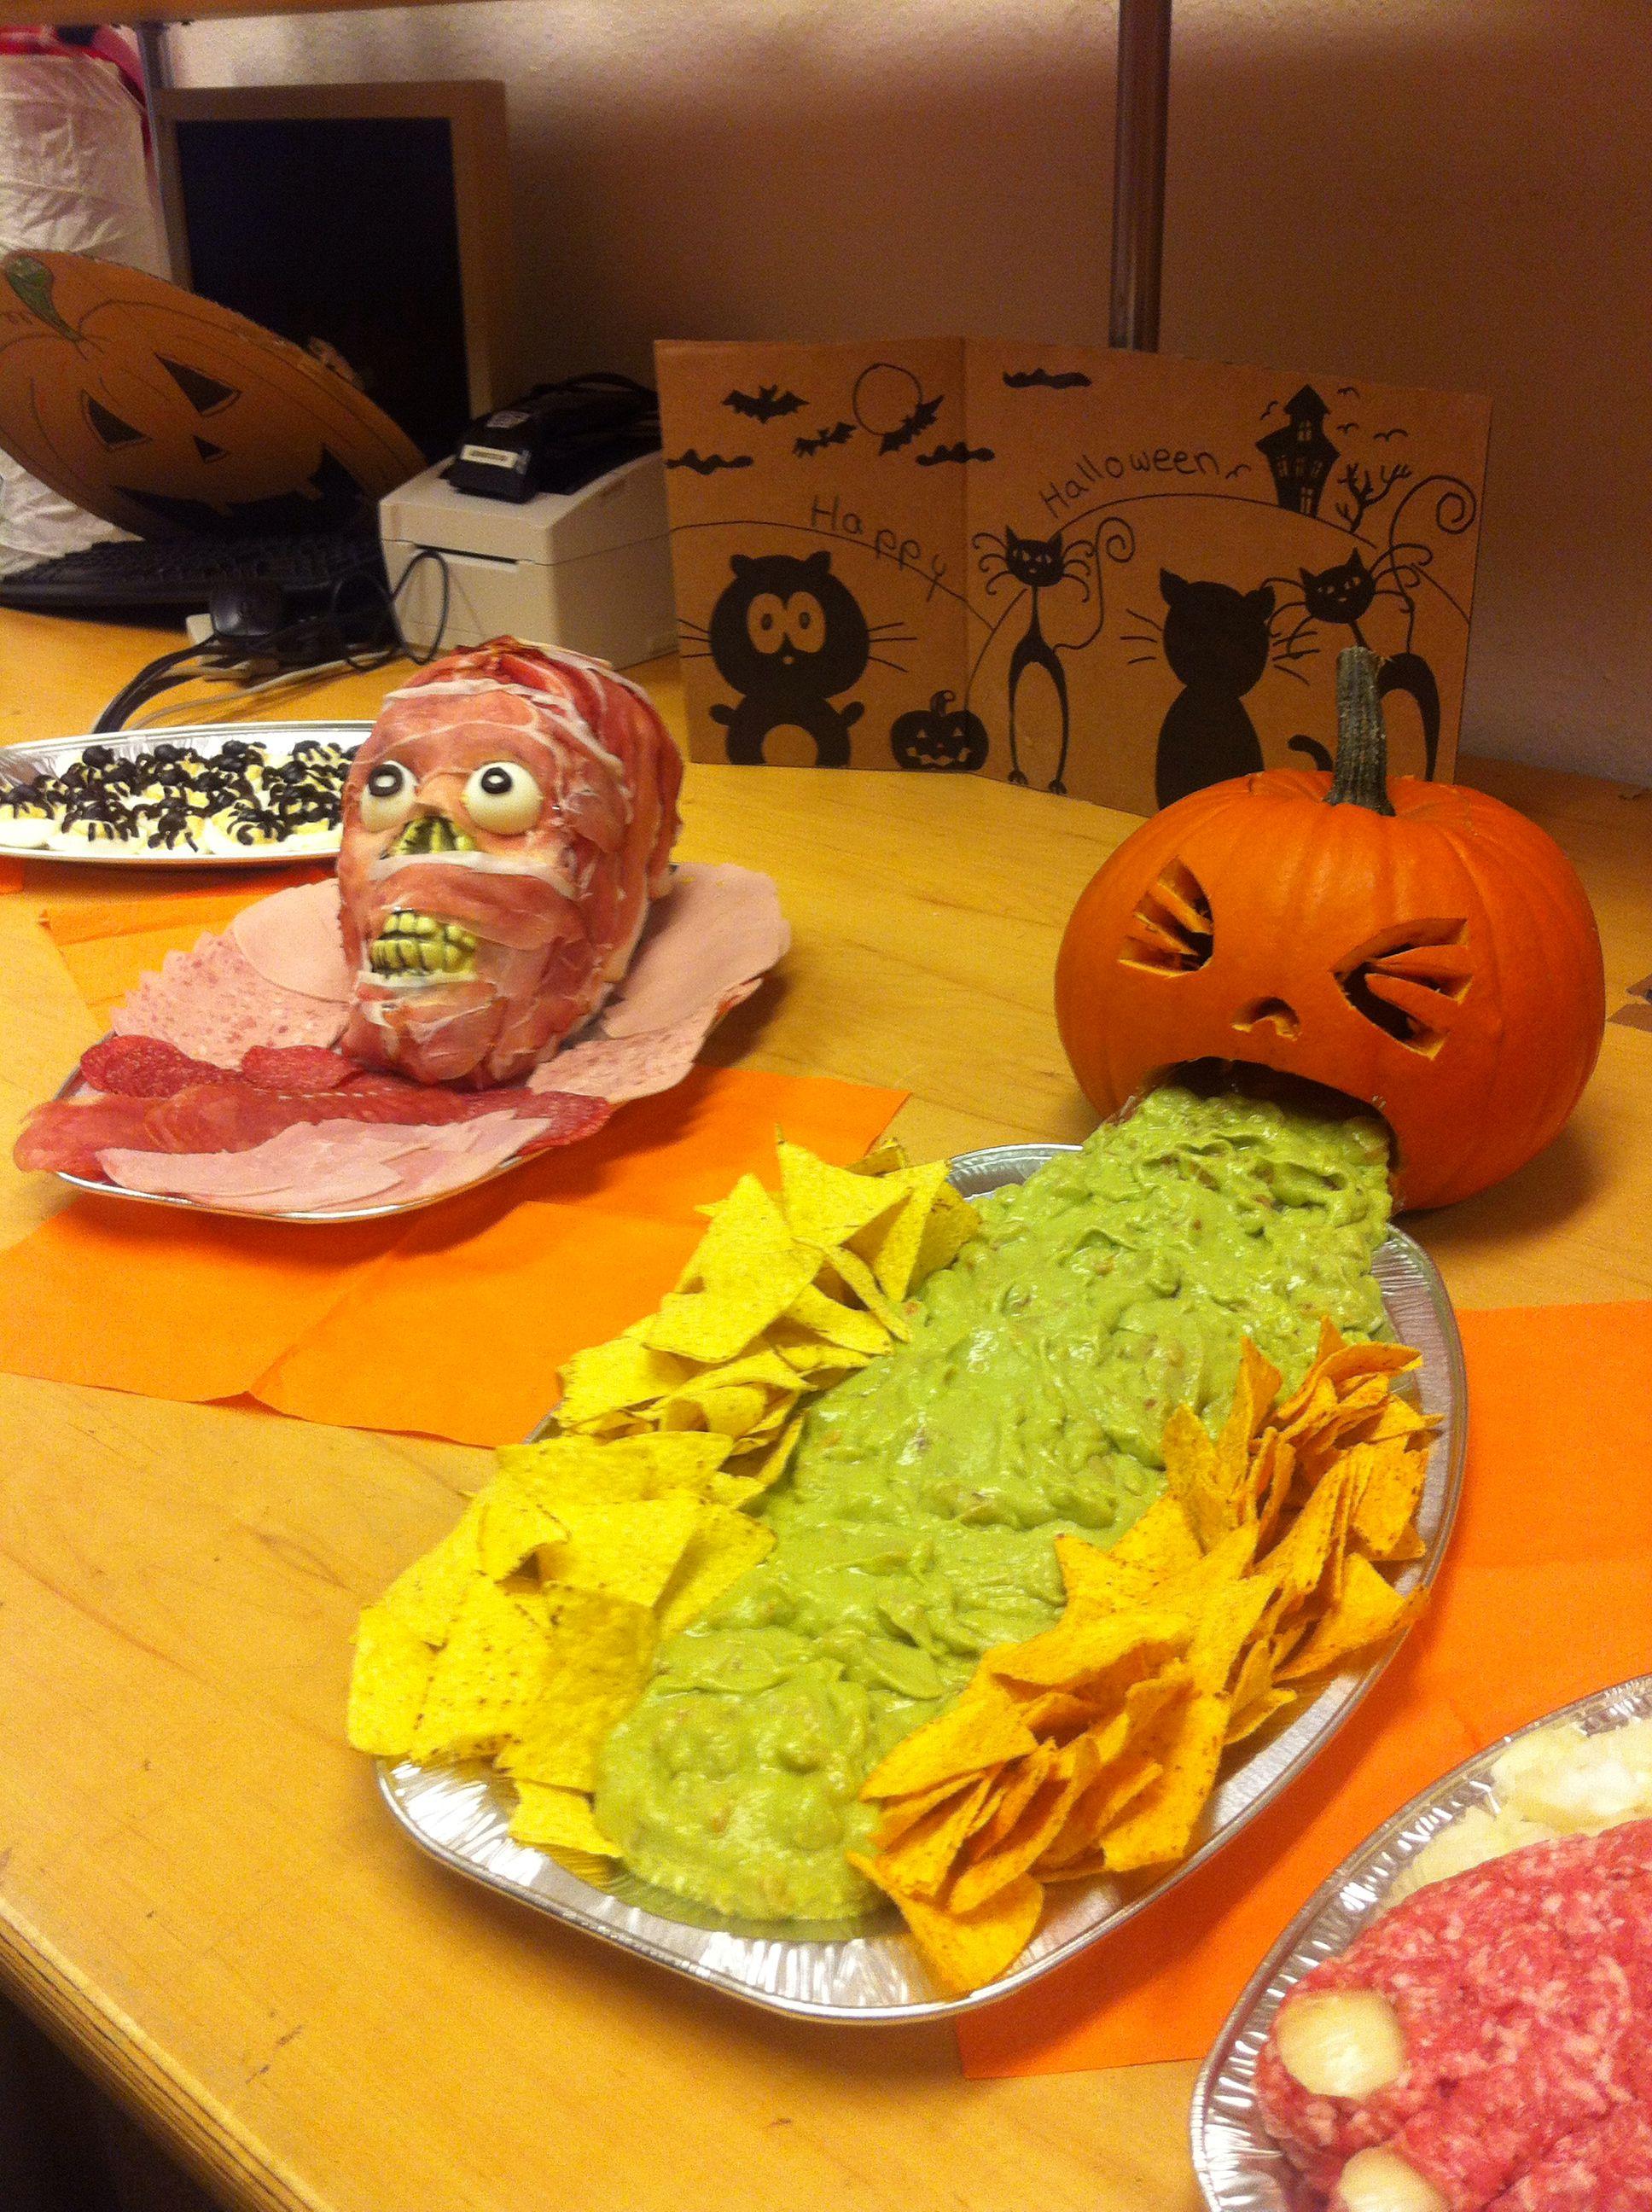 Halloween Kindergeburtstag.Halloween Food Buffet Kotzender Kurbis Mit Guacamole Und